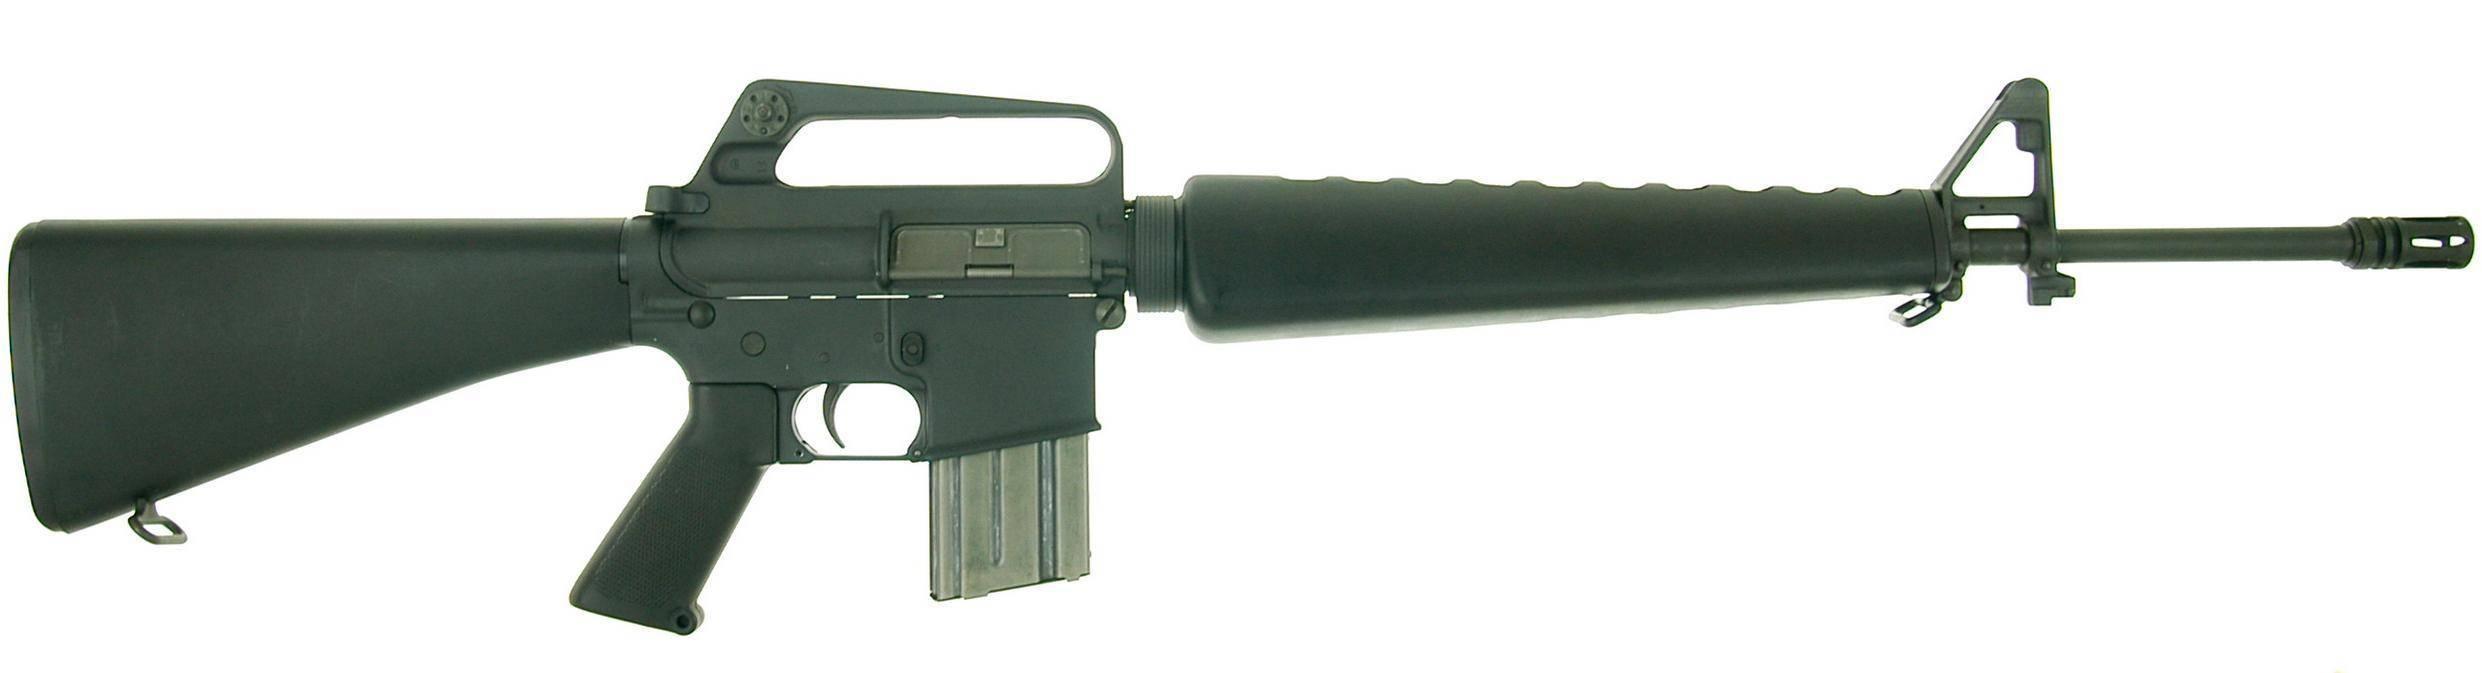 M15 (винтовка) википедия